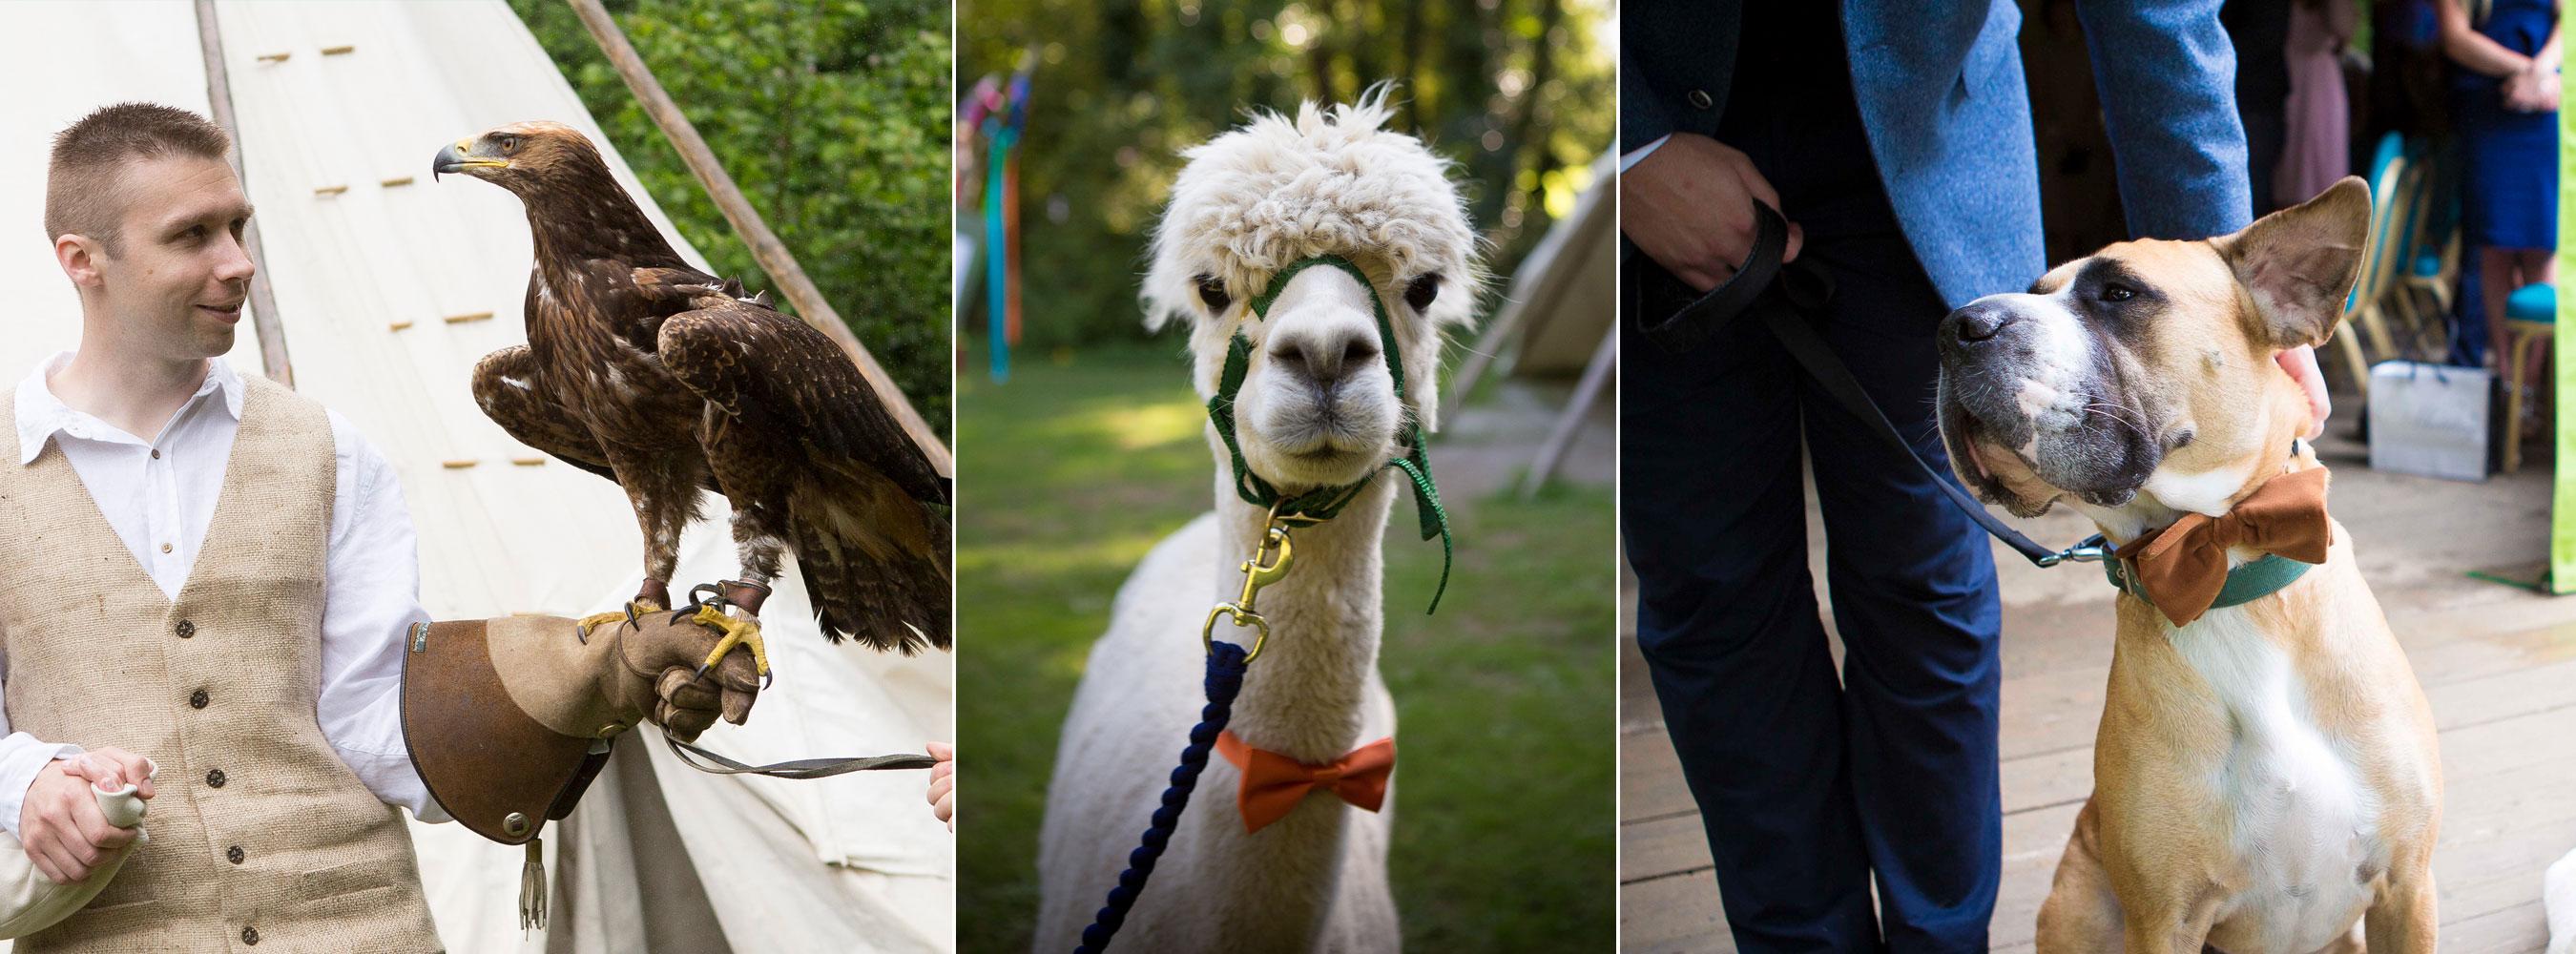 Ring Dogs Eagle Alpacas